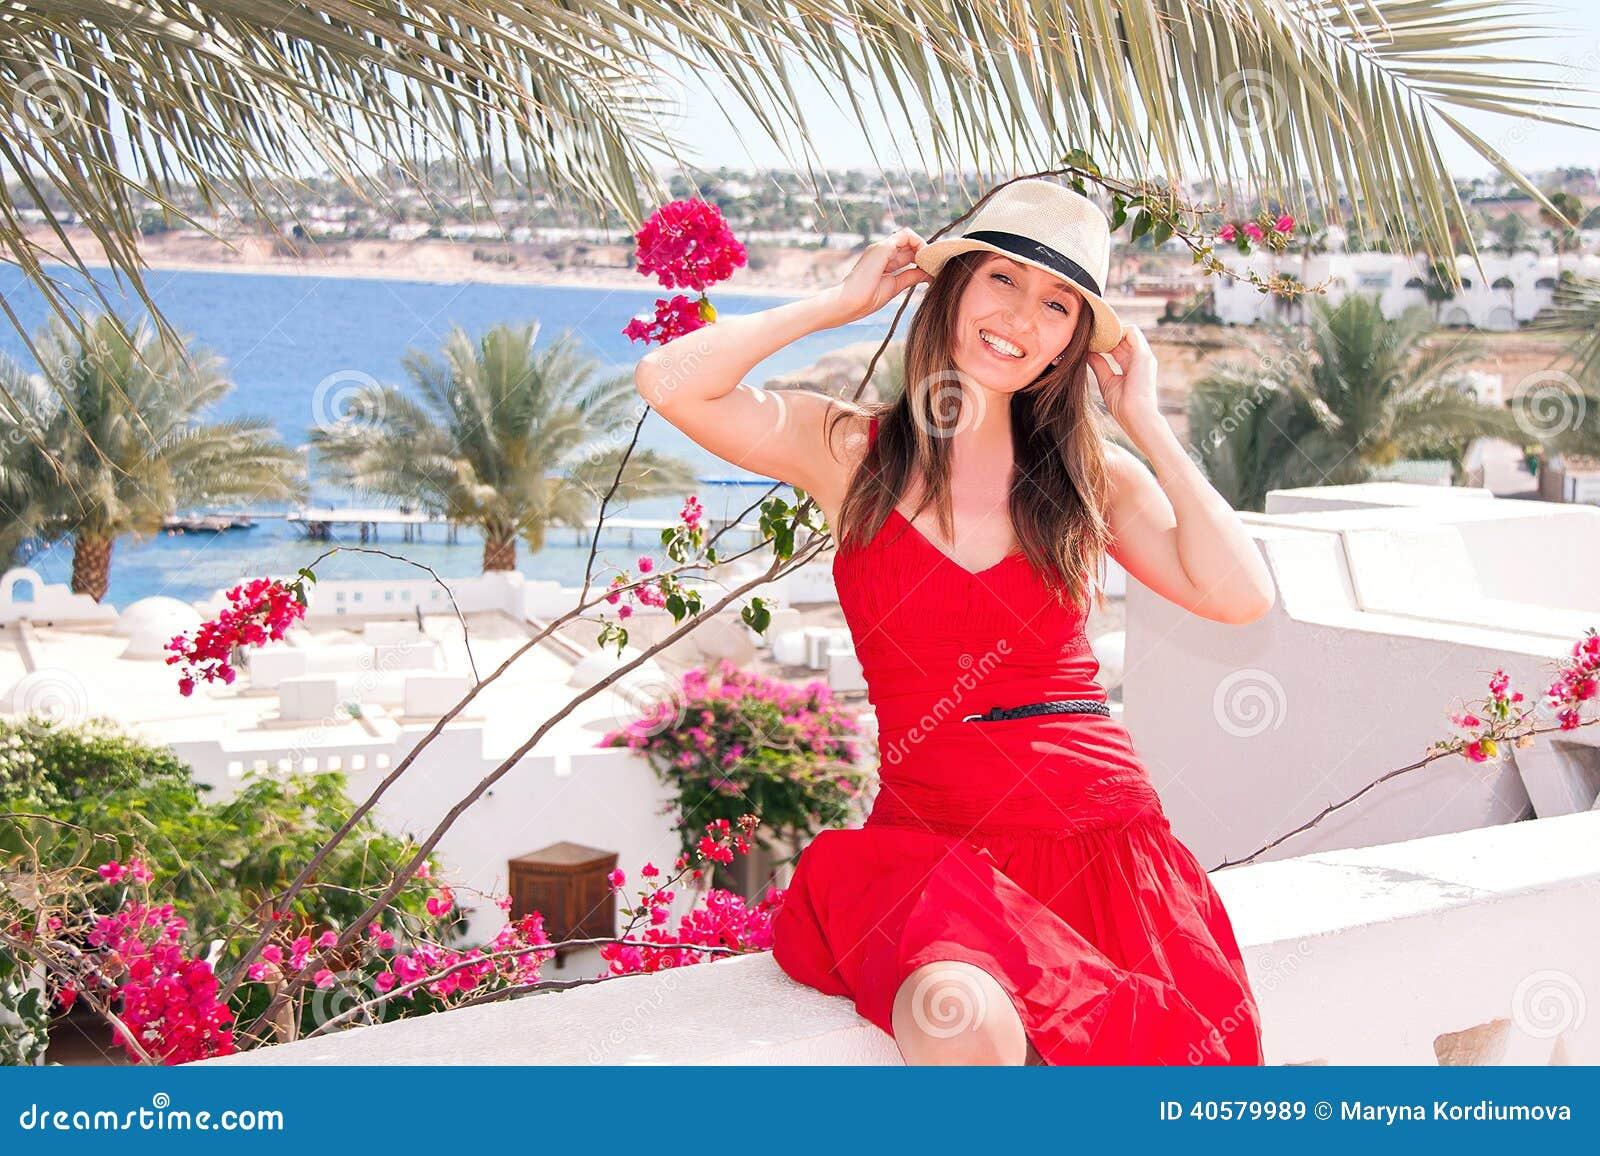 Отдыхая женщина на террасе с взглядом на море